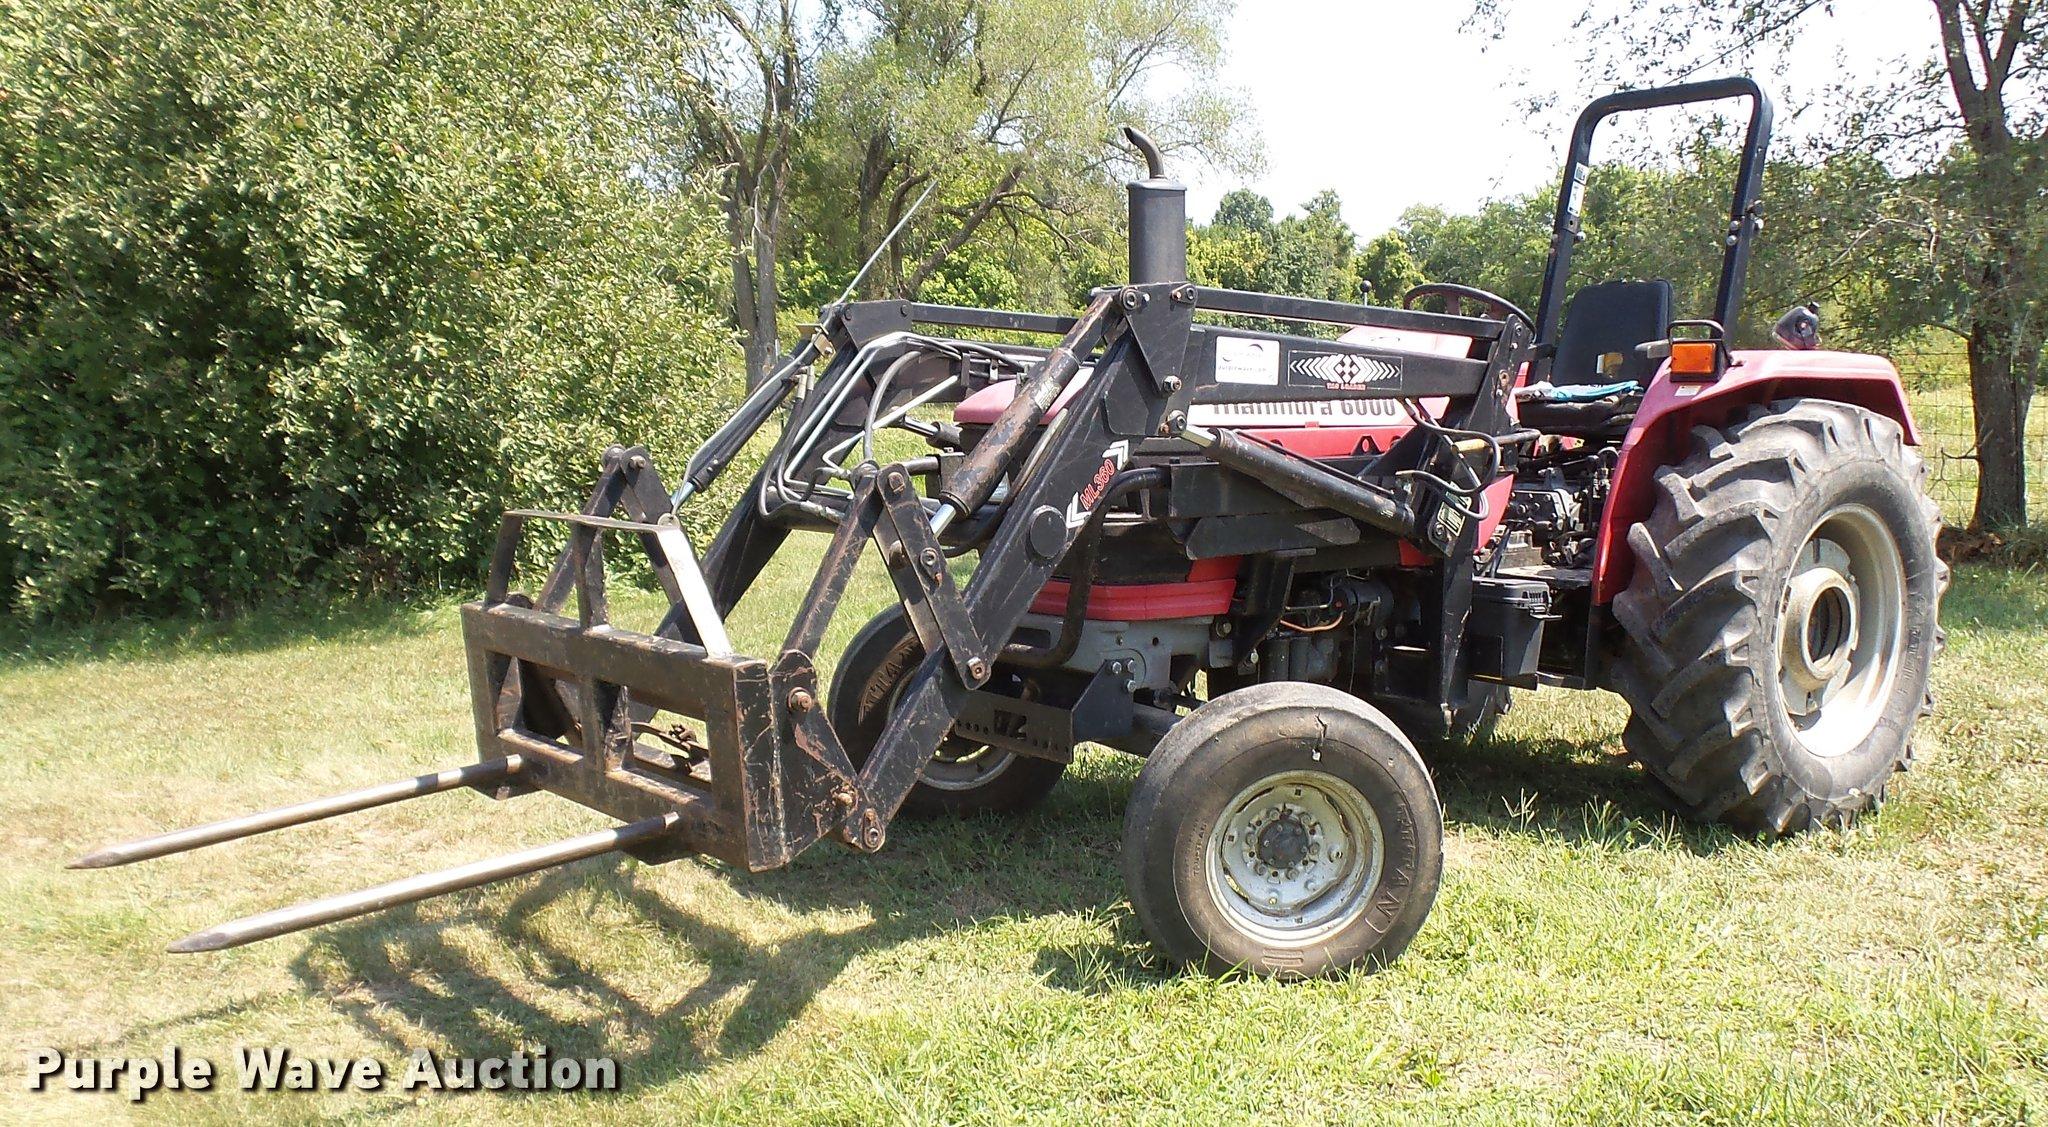 mahindra 6000 tractor manual wiring diagram u2022 rh 45 32 164 46 Mahindra Tractor Ignition Wiring Diagrams Electrical Wiring Diagrams